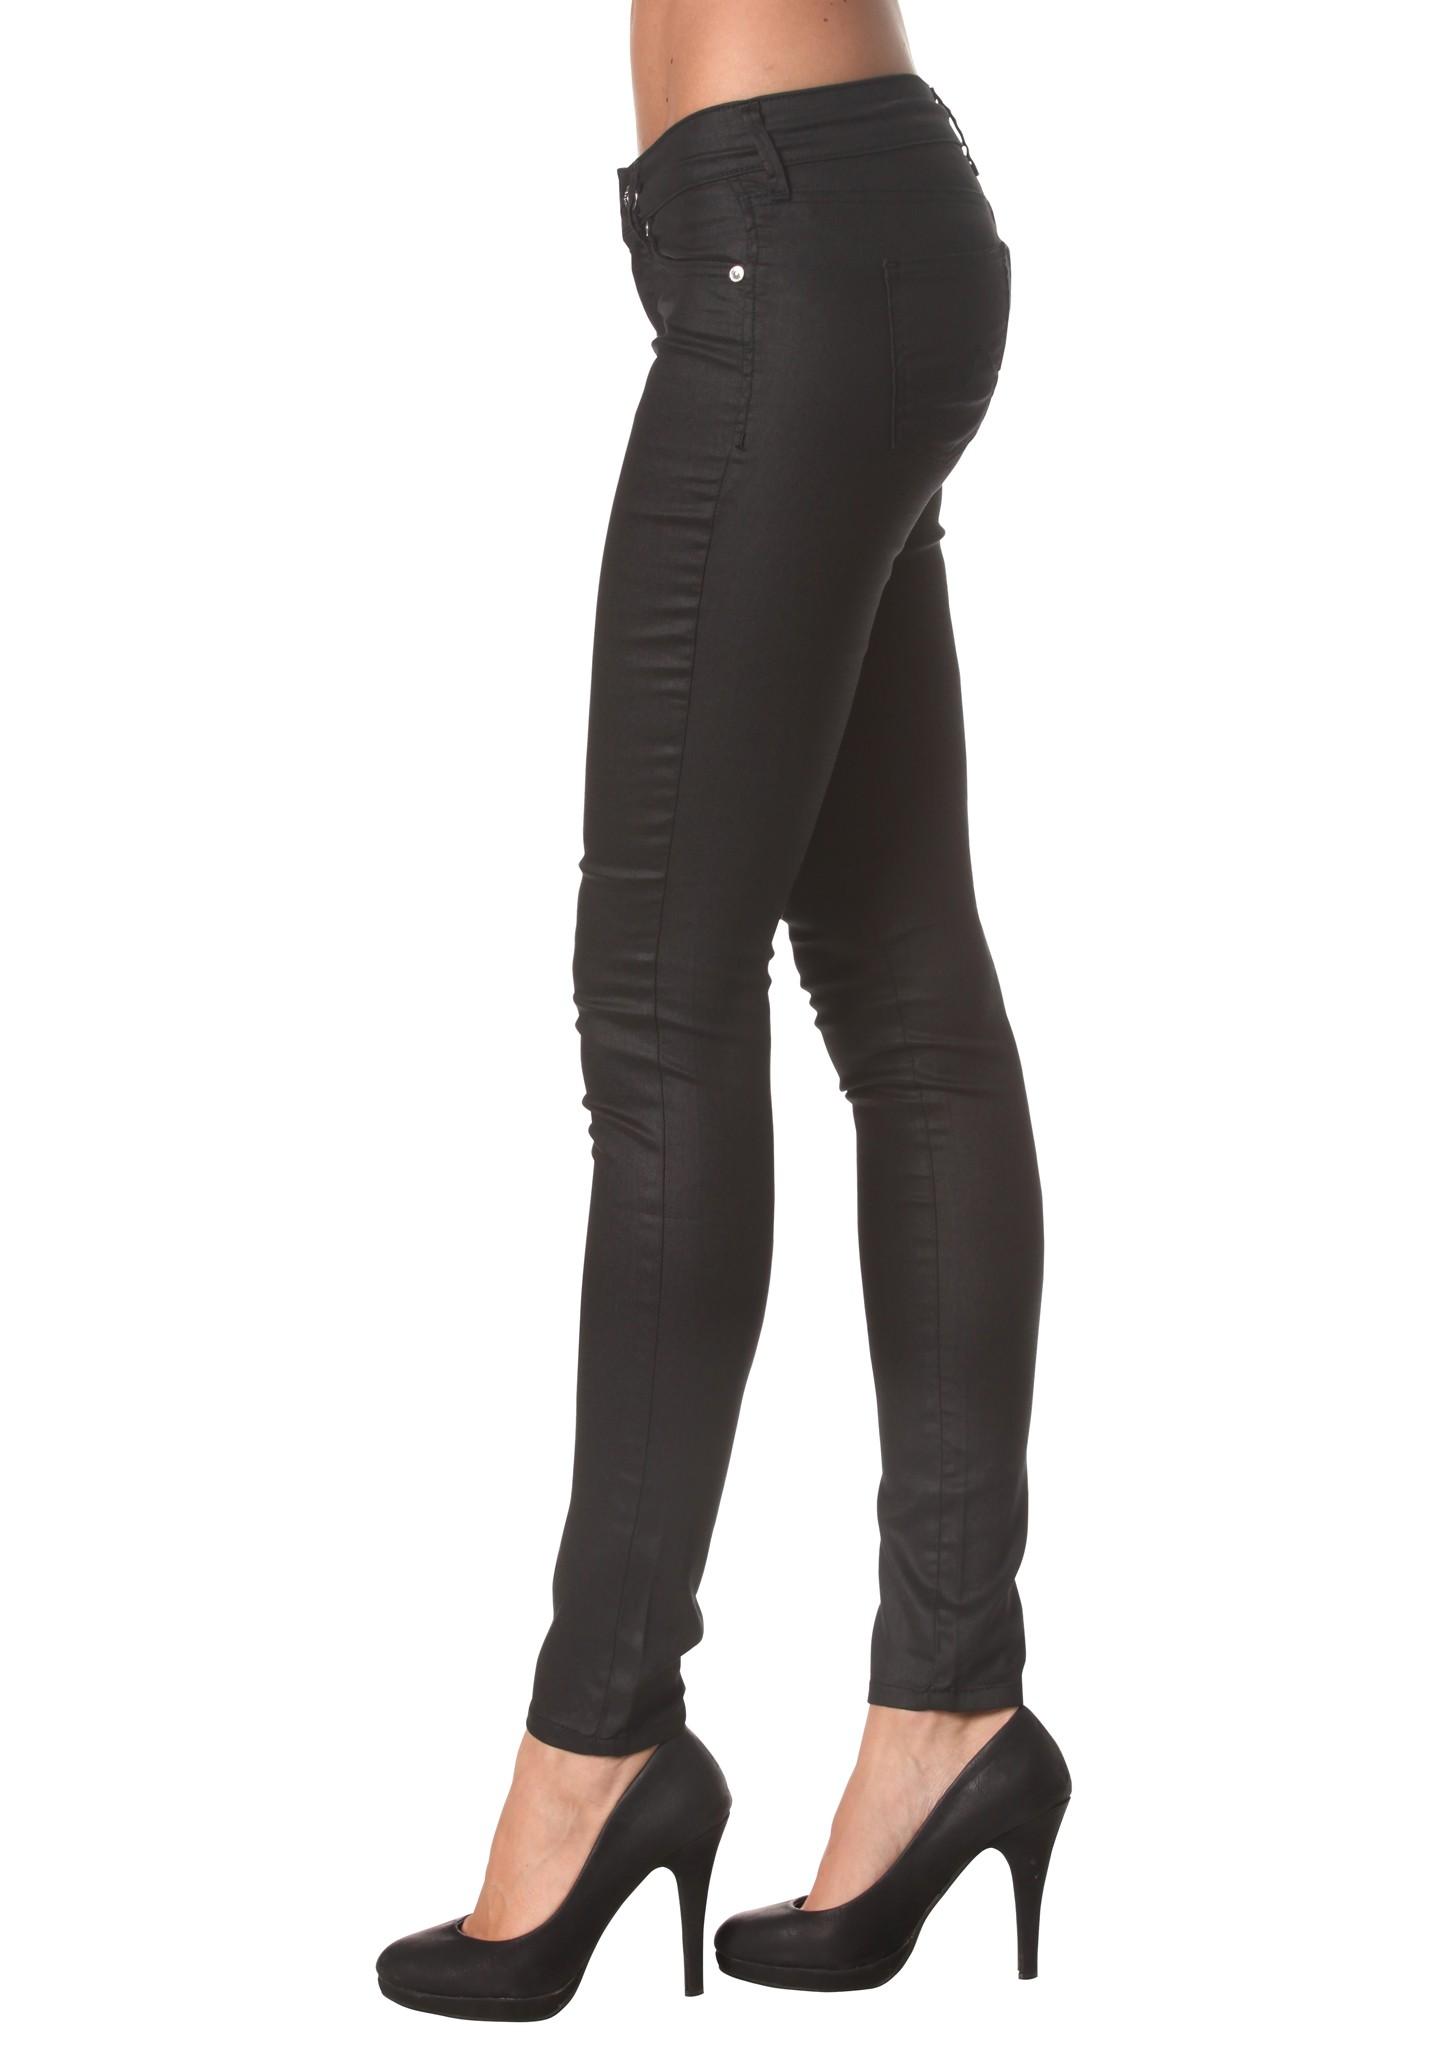 neu pepe jeans pixie damen jeans hose. Black Bedroom Furniture Sets. Home Design Ideas